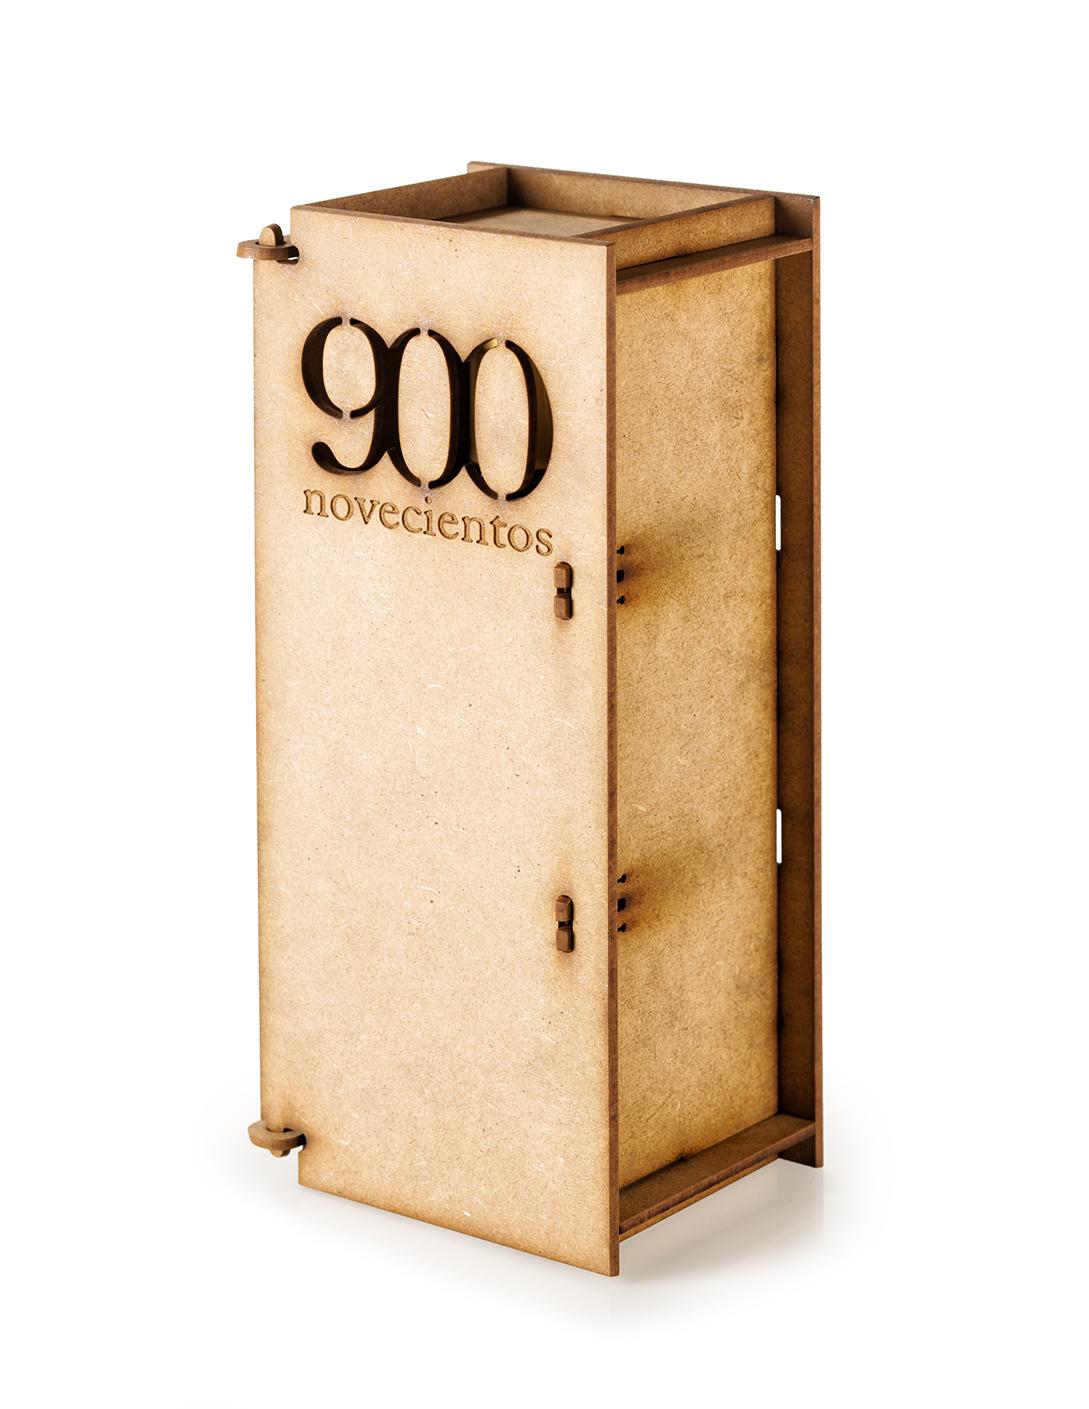 Caja para botella 500 ml. AOVE 900